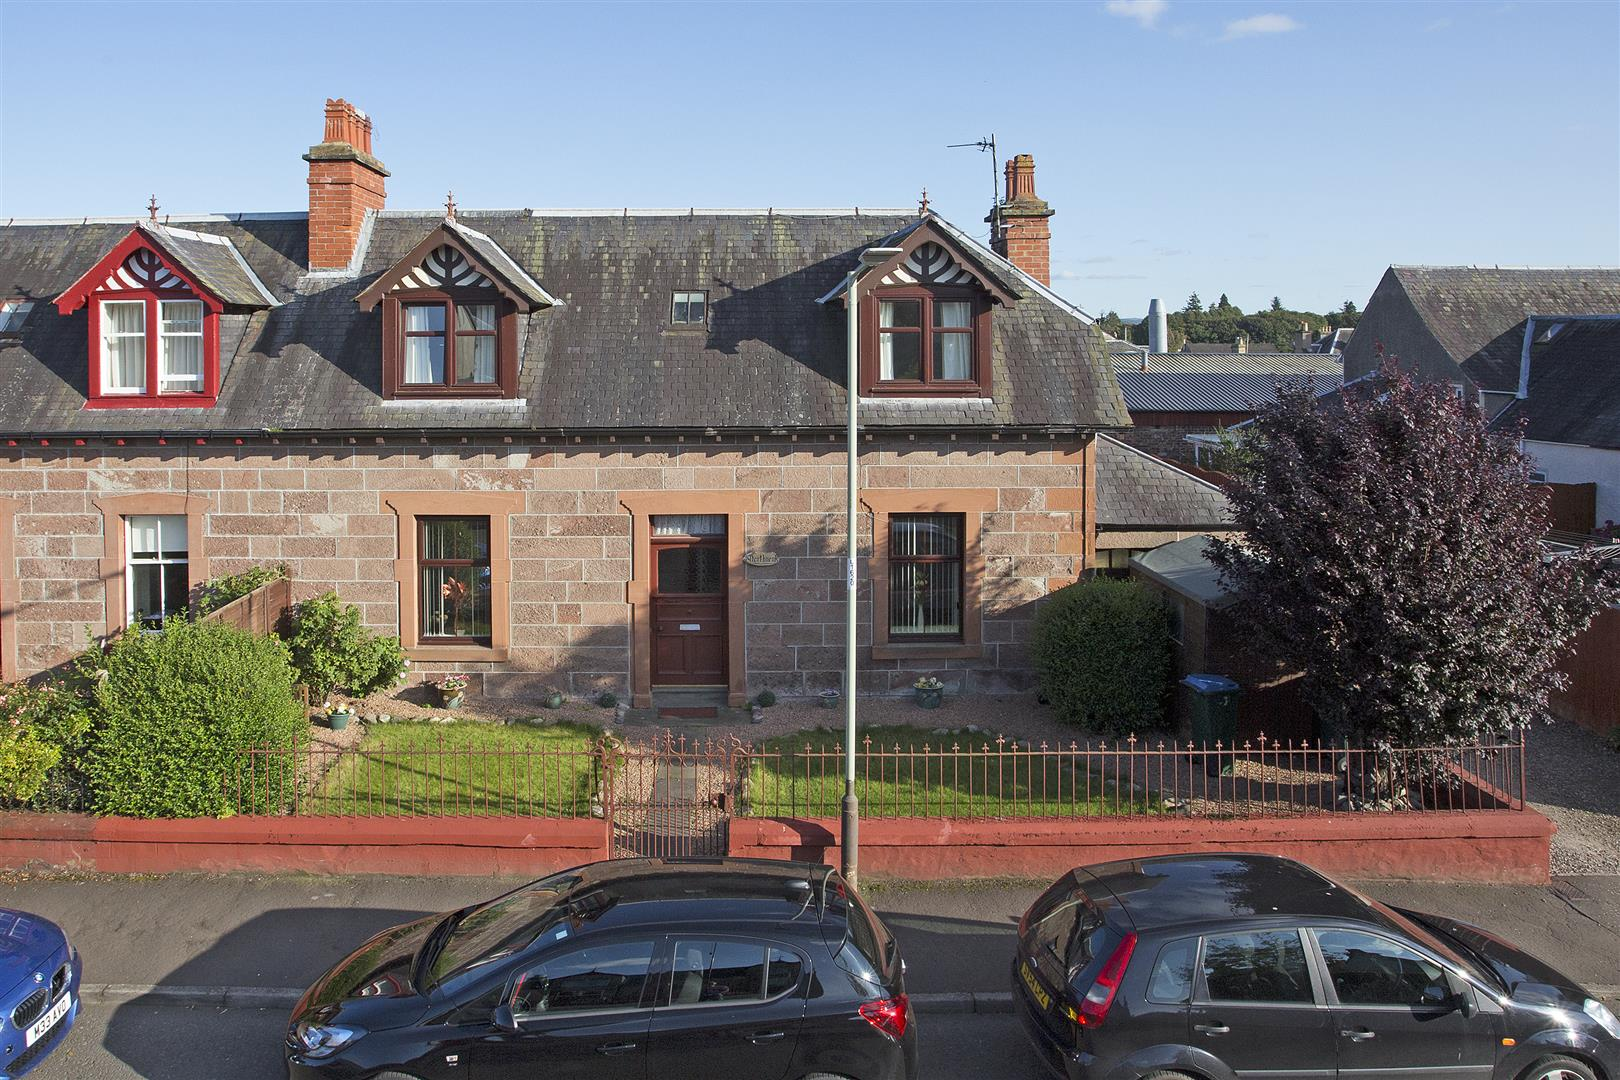 North Neuk, George Street, Blairgowrie, Perthshire, PH10 6HP, UK